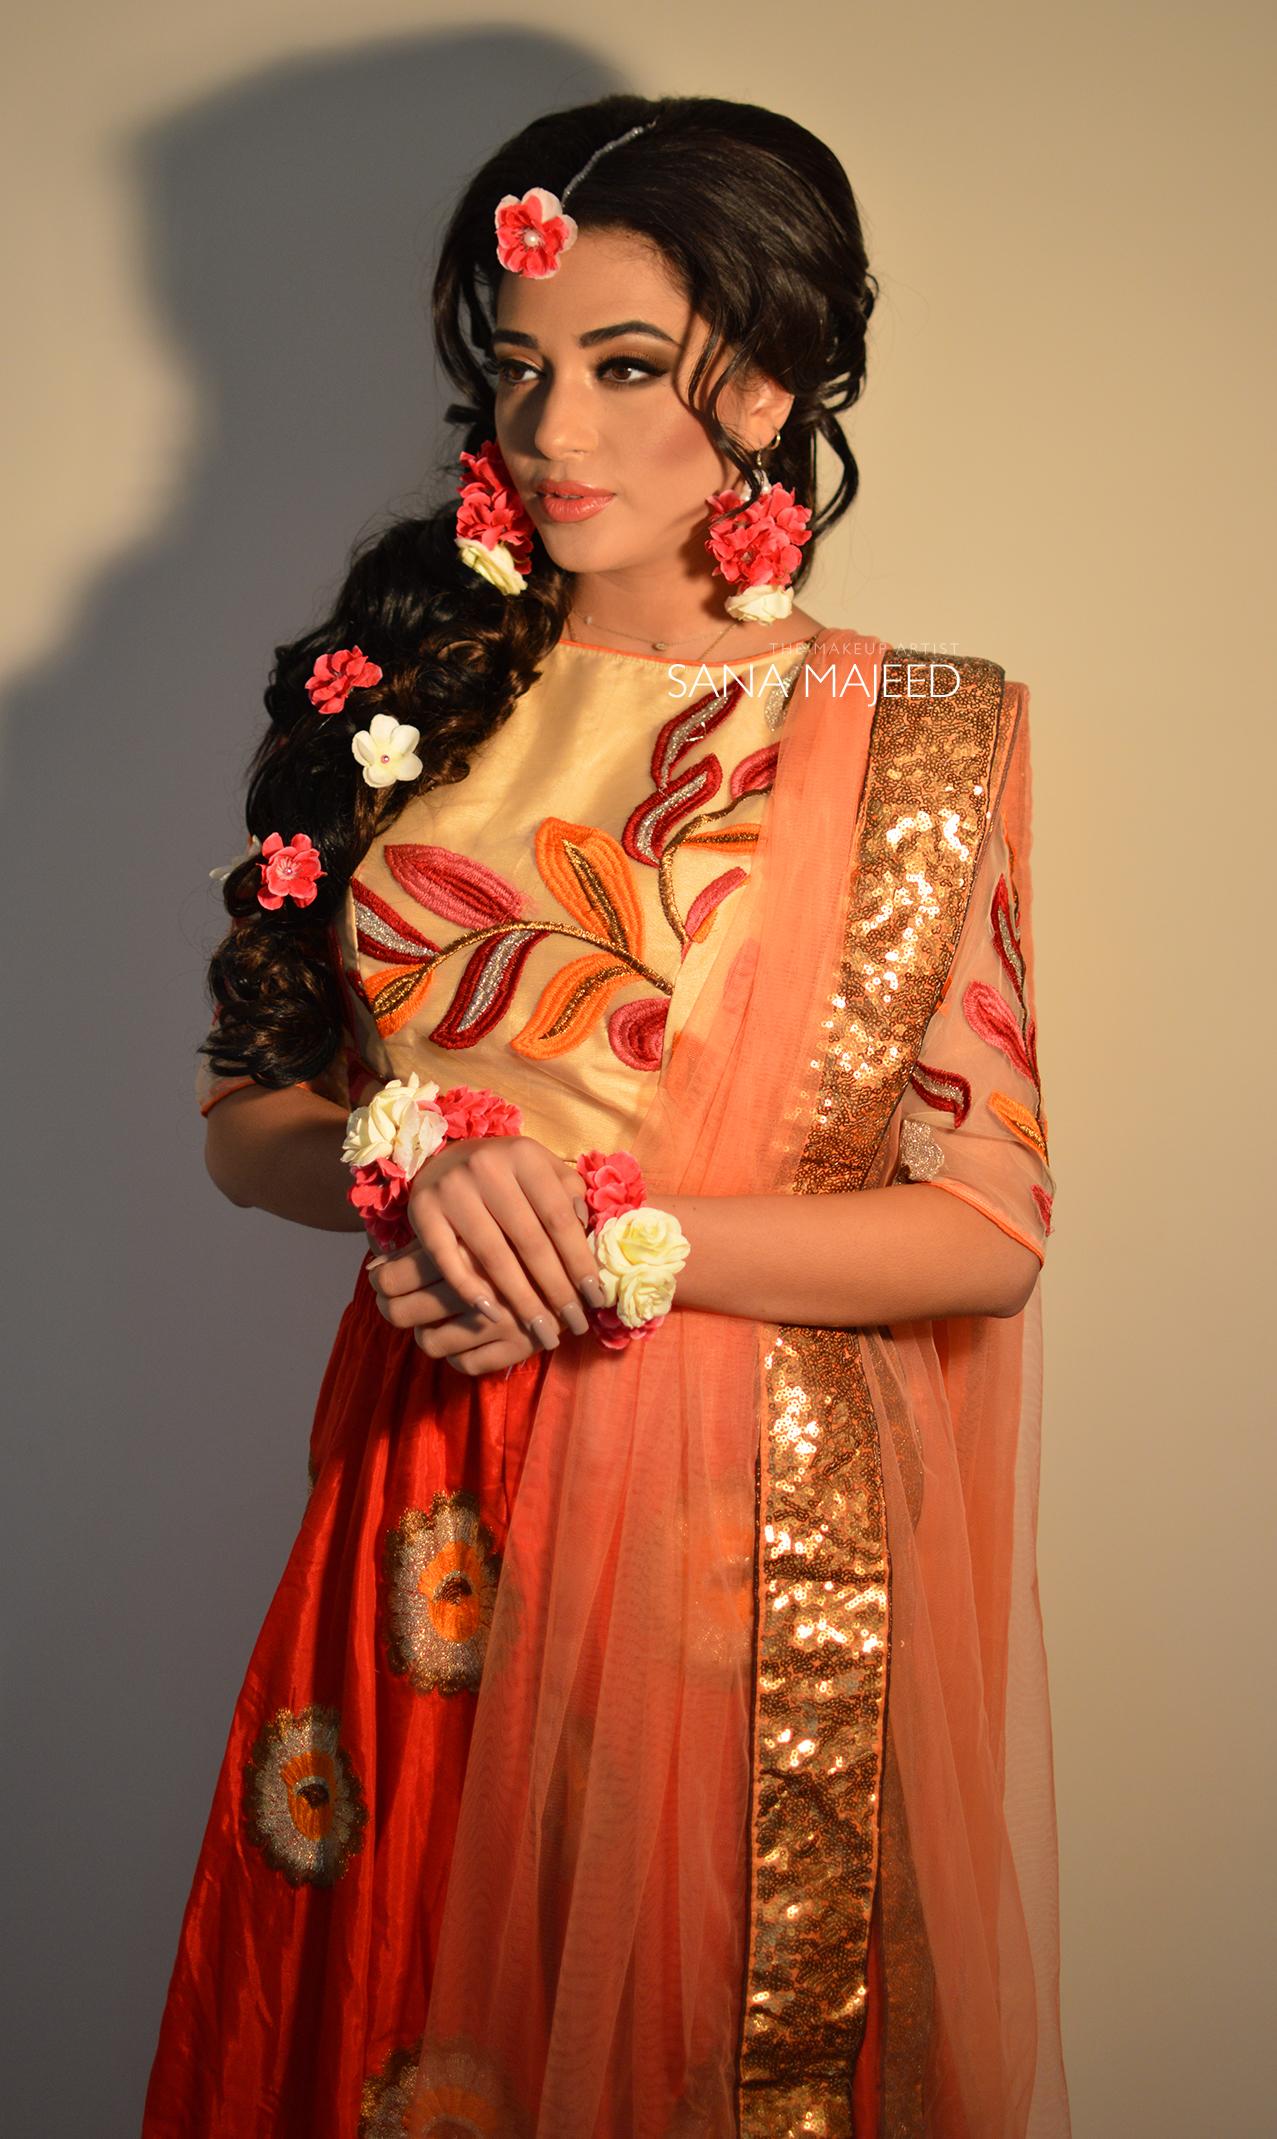 Mhendi Bride